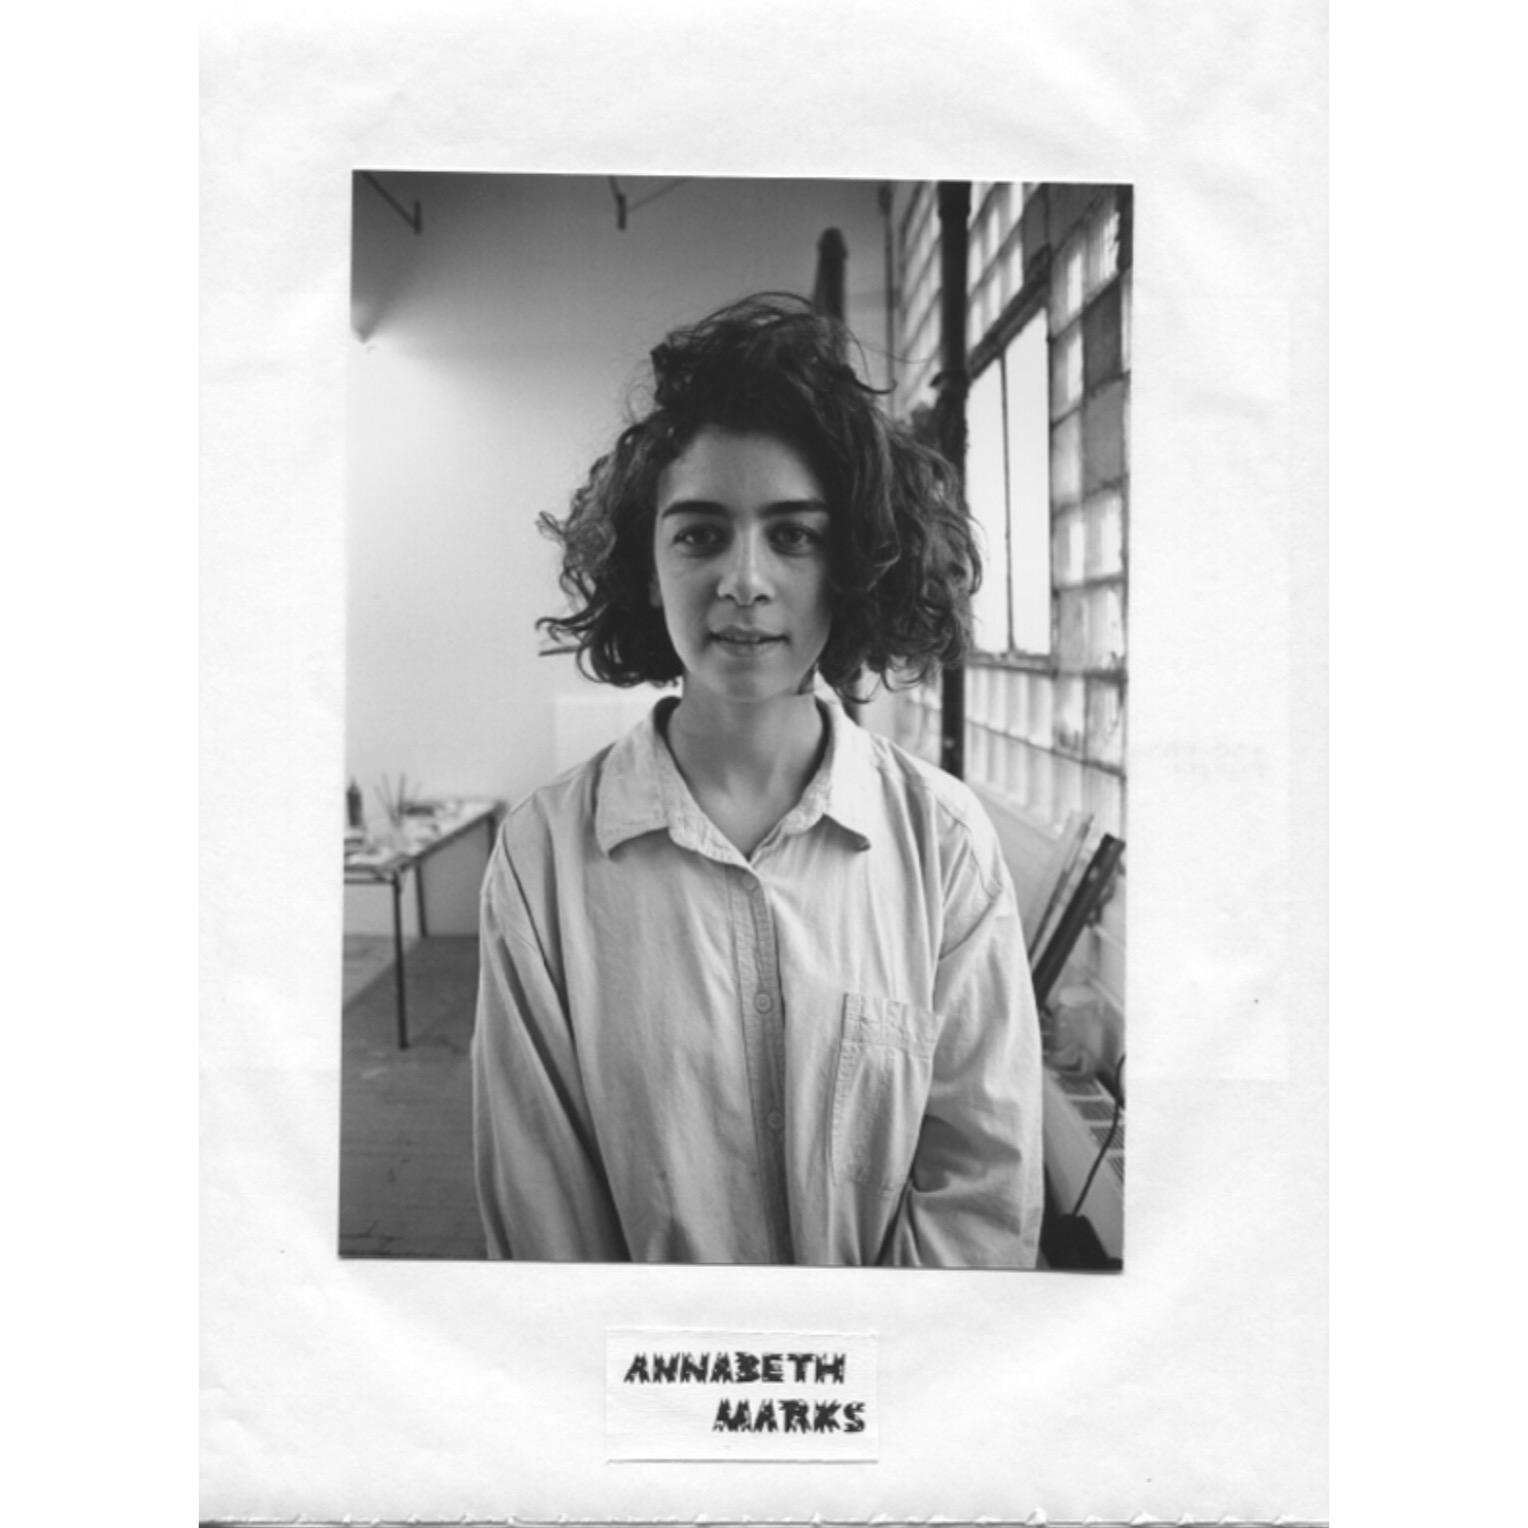 ANNABETH MARKS WIDE RAINBOW ARTIST